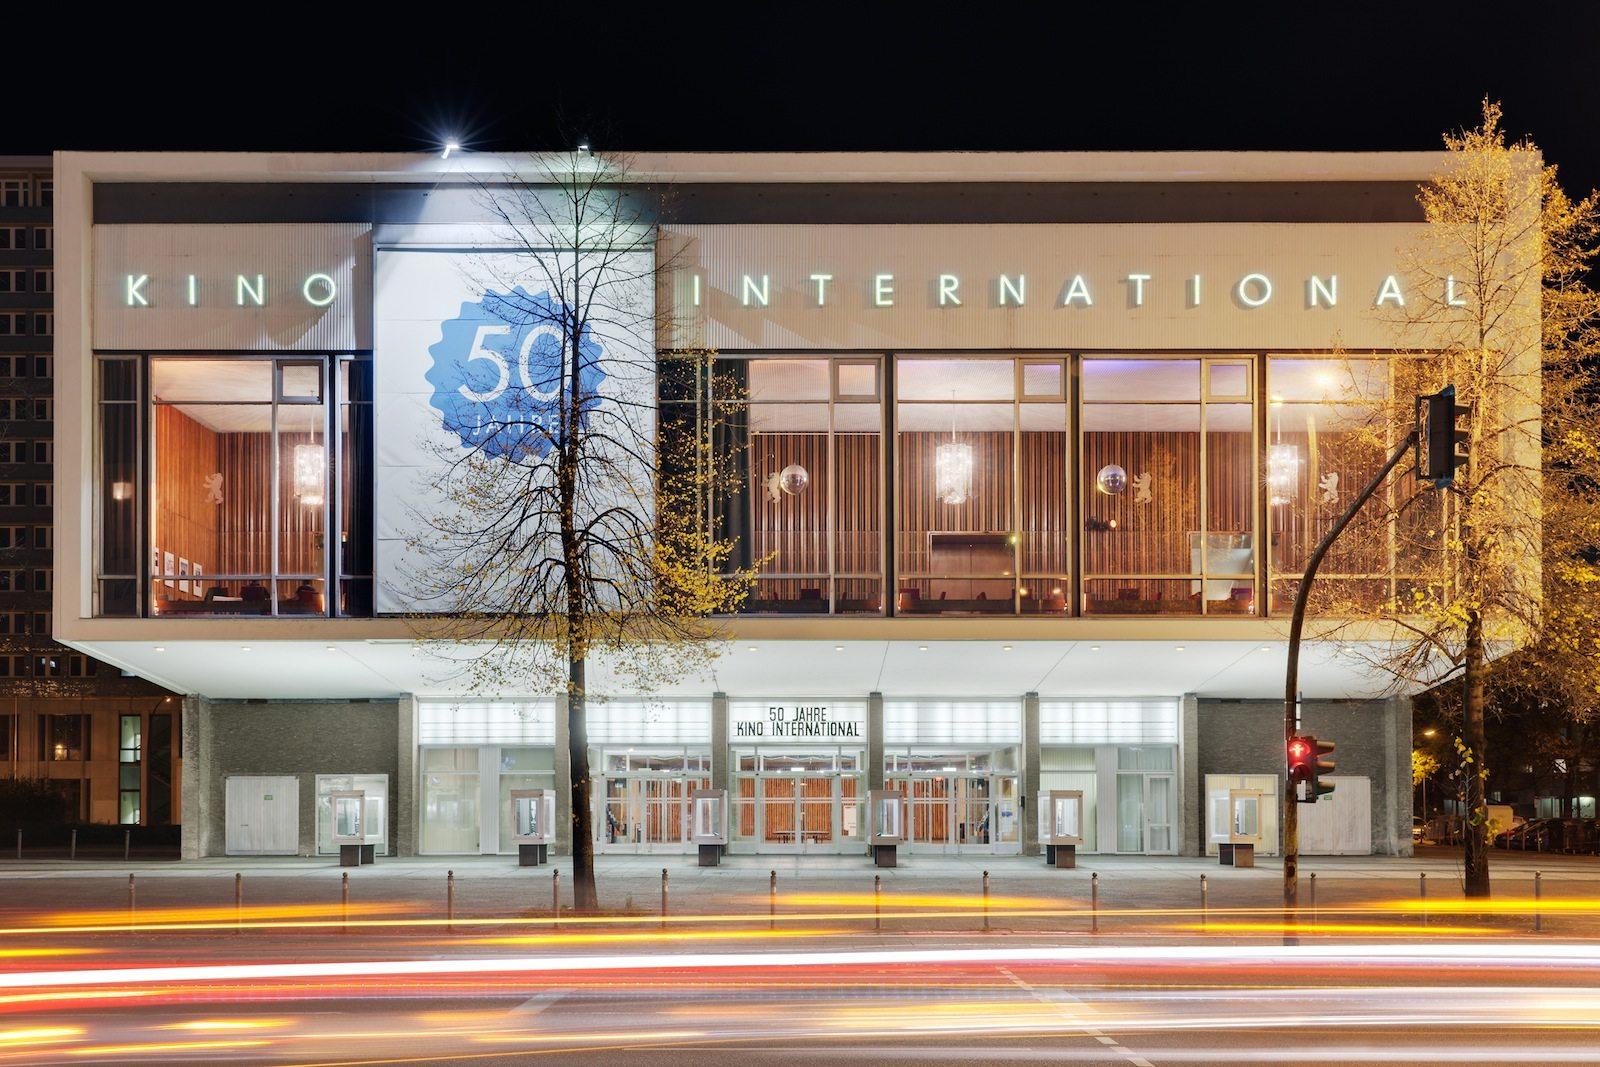 Fest. 2013 feiert das Kino International 50-jähriges Jubiläum.